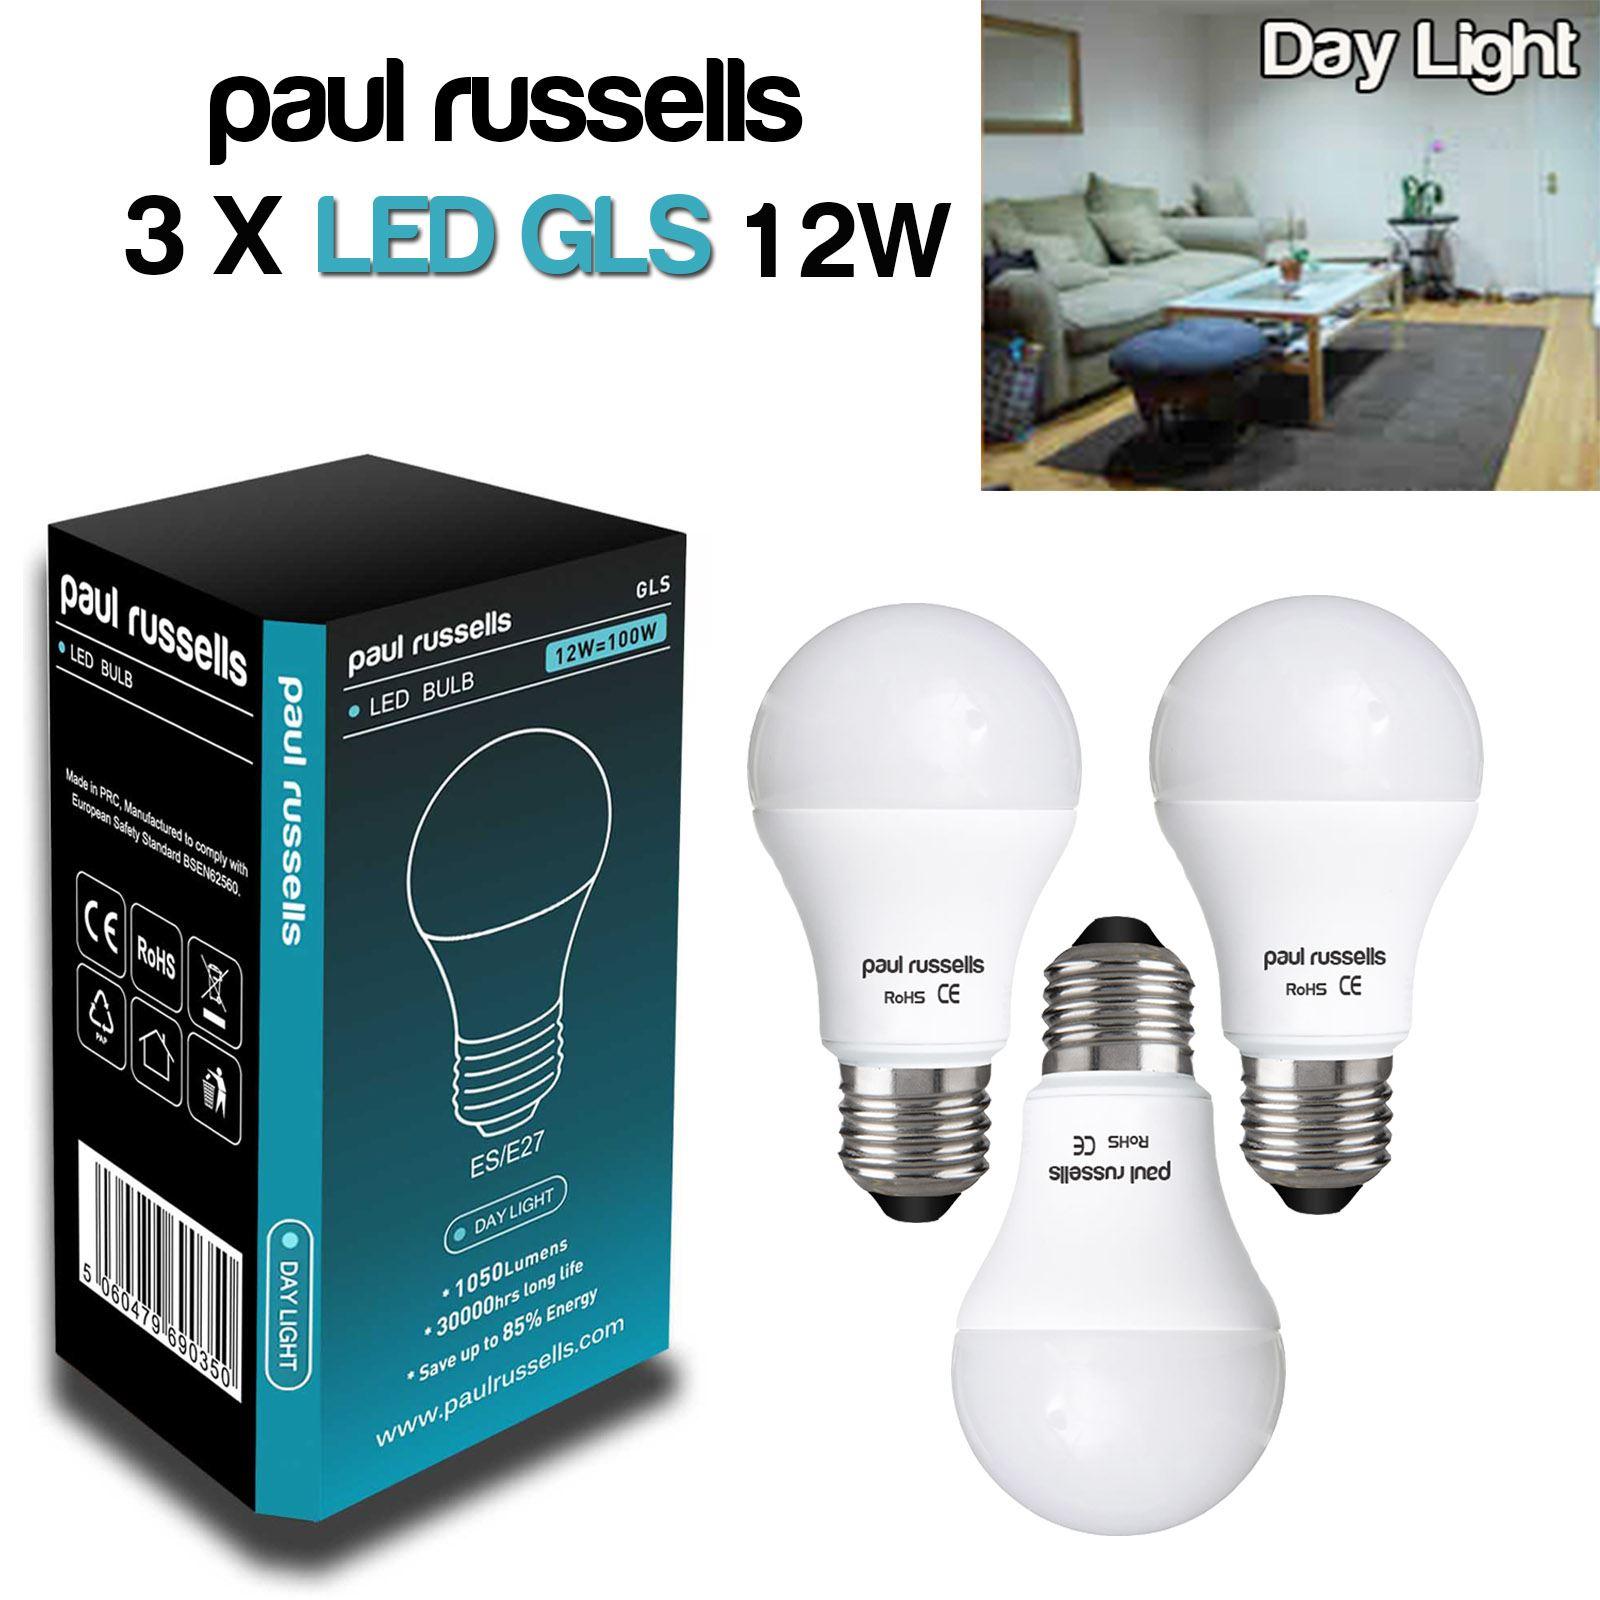 e14 b22 e27 led light bulbs cheap long life 25w 40w 60w 100 watt equivalent ebay. Black Bedroom Furniture Sets. Home Design Ideas